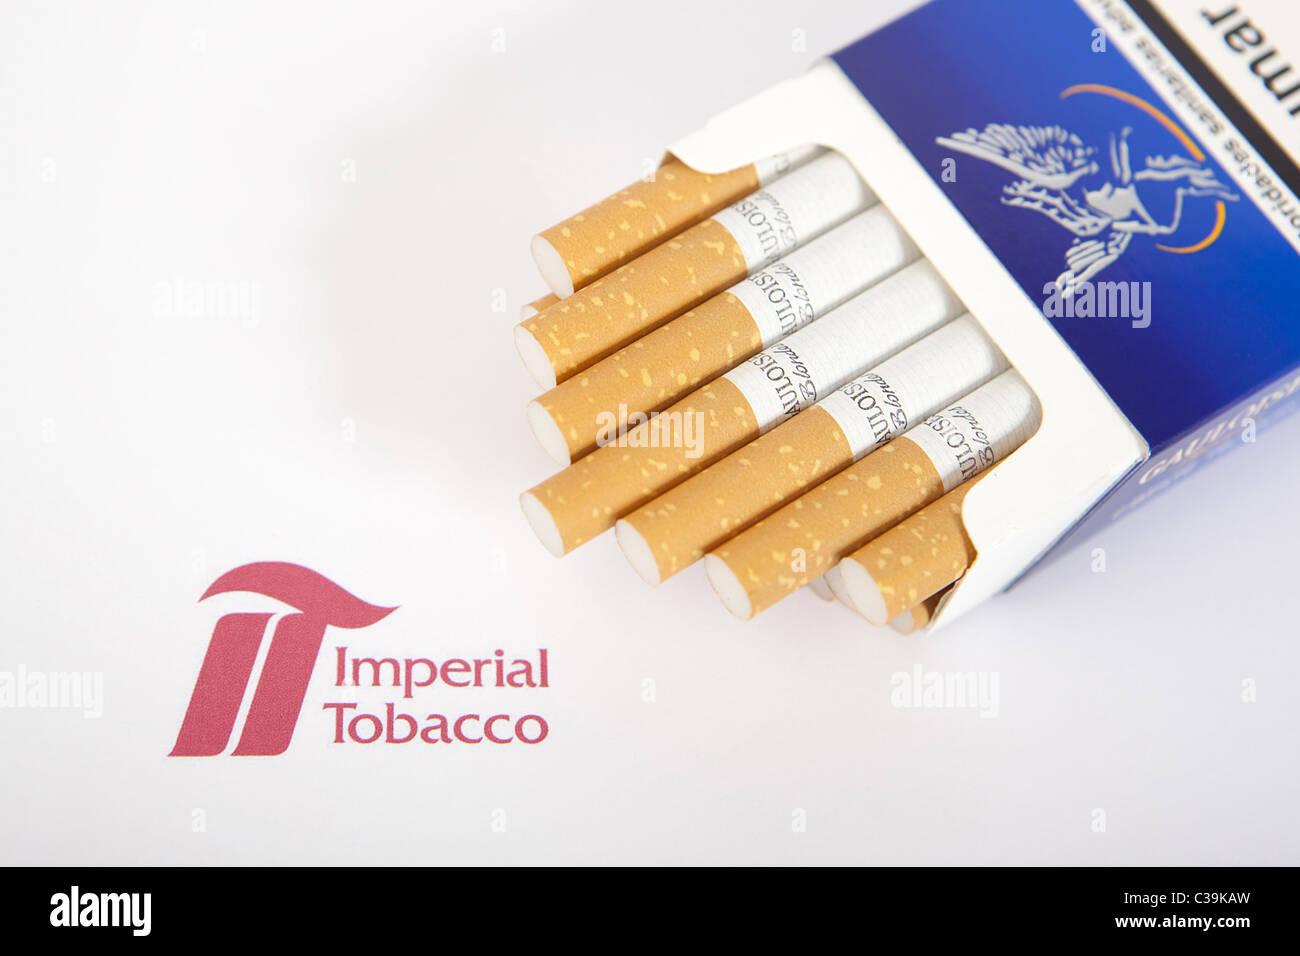 Pack of 20 cigarettes Marlboro cost